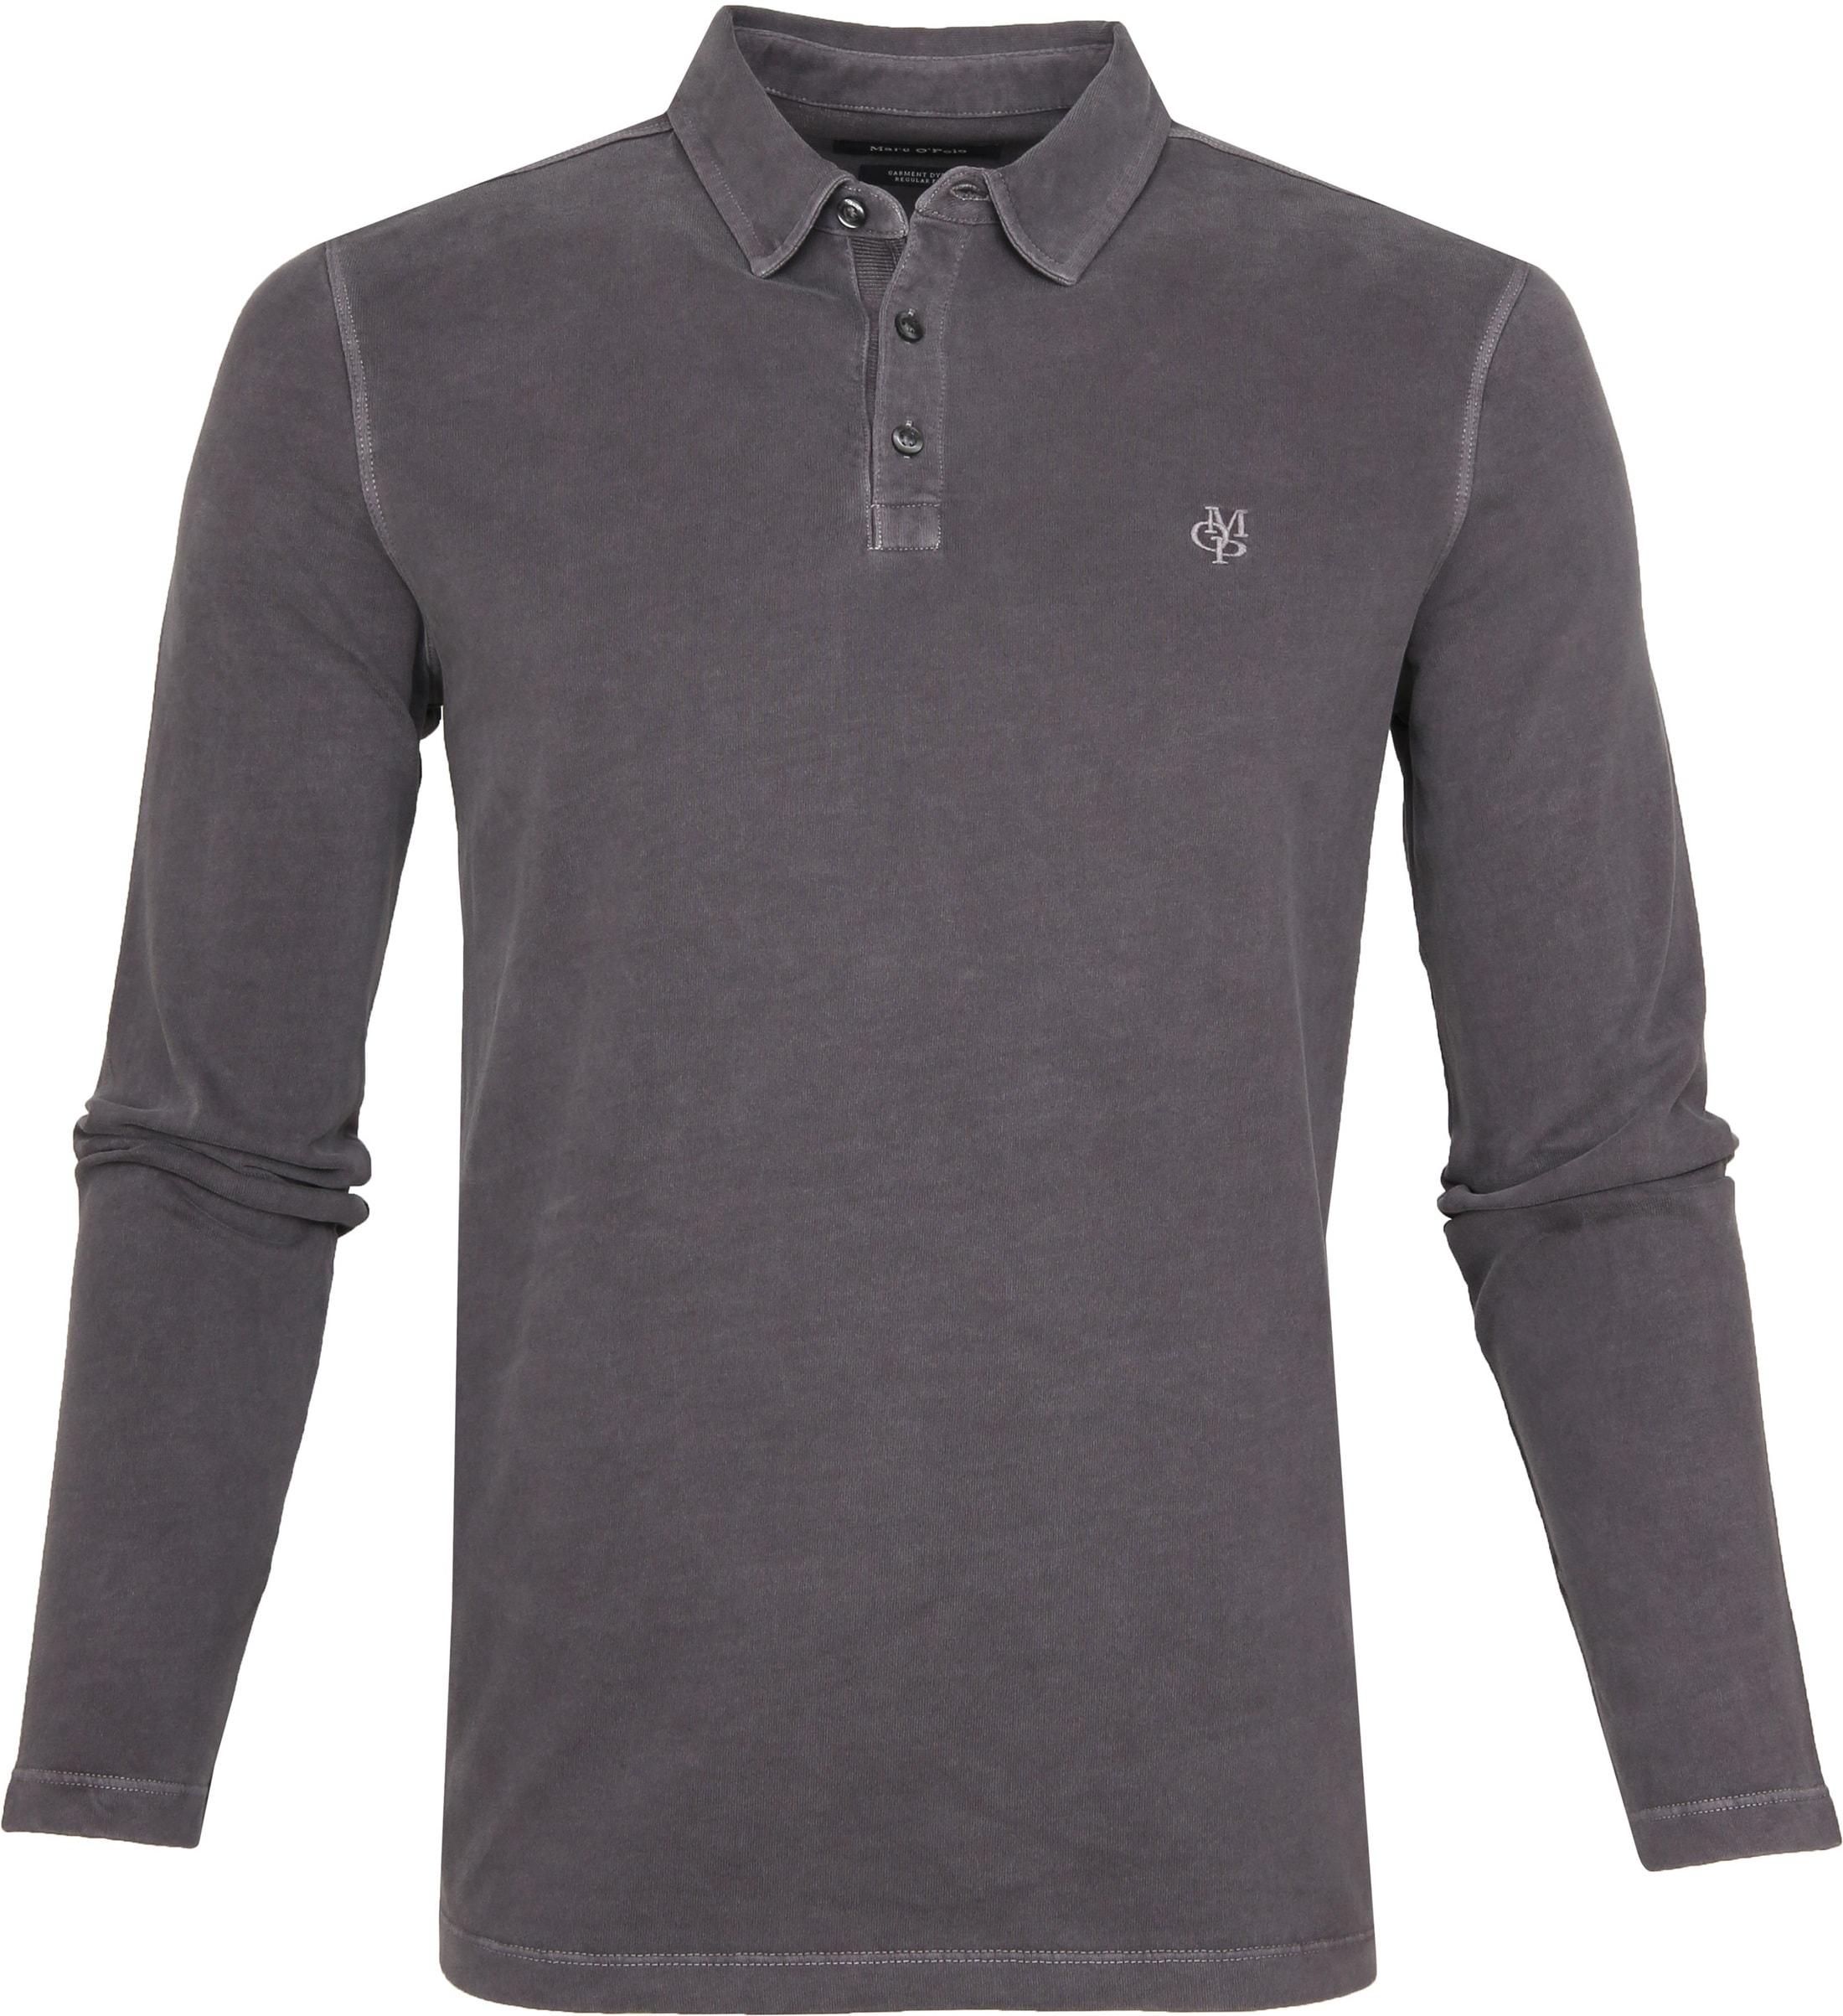 b4094fecfefe68 Marc O'Polo LS Poloshirt Dark Grey 928223655052 order online   Suitable